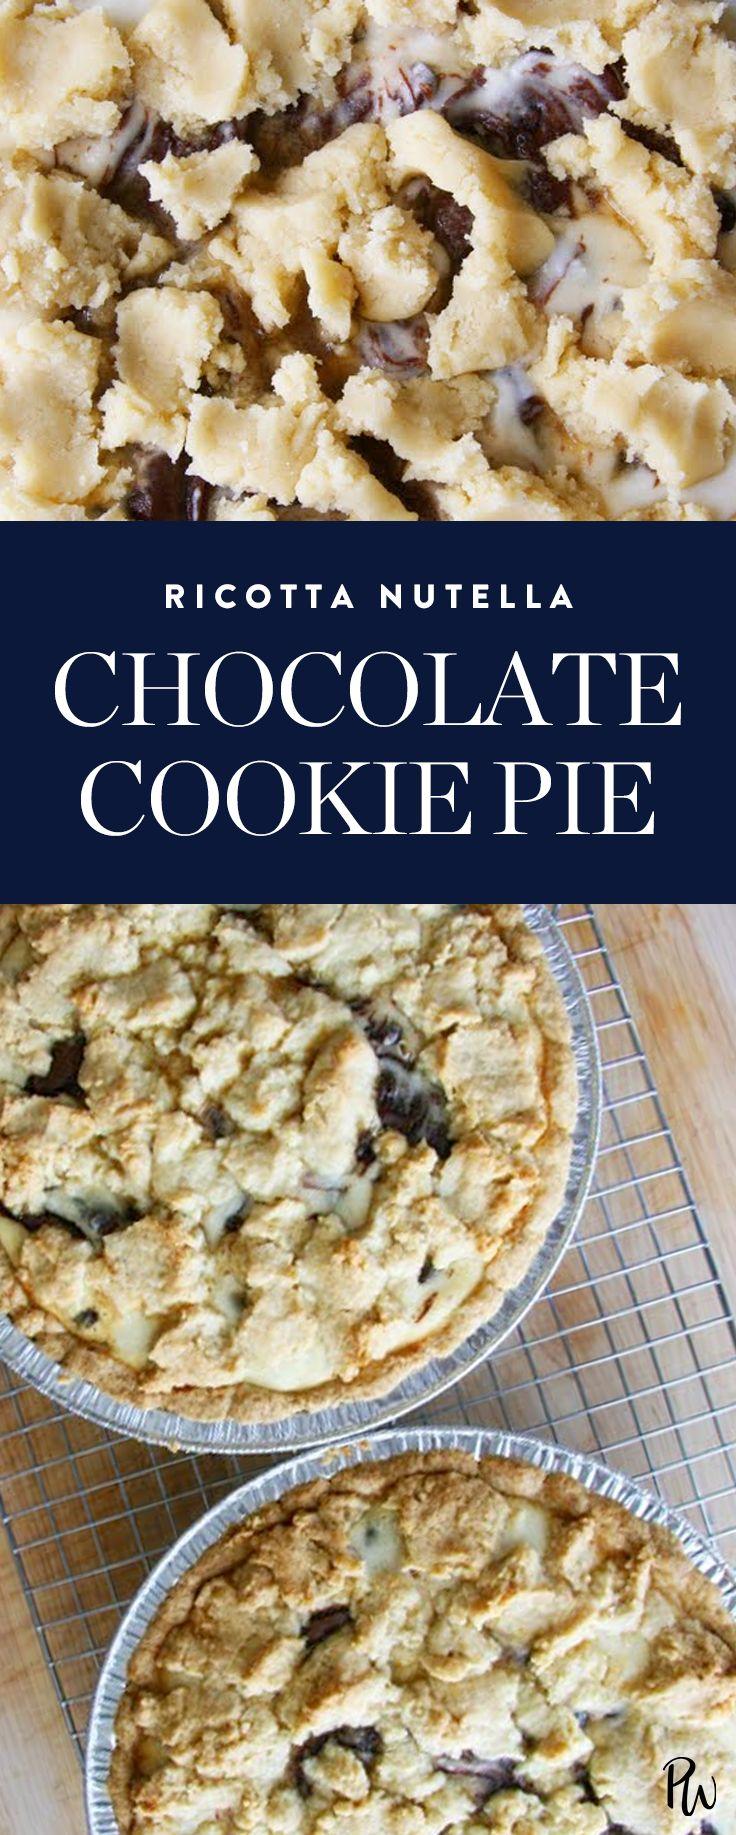 Get this tasty Ricotta Nutella Chocolate Cookie Pie recipe today!